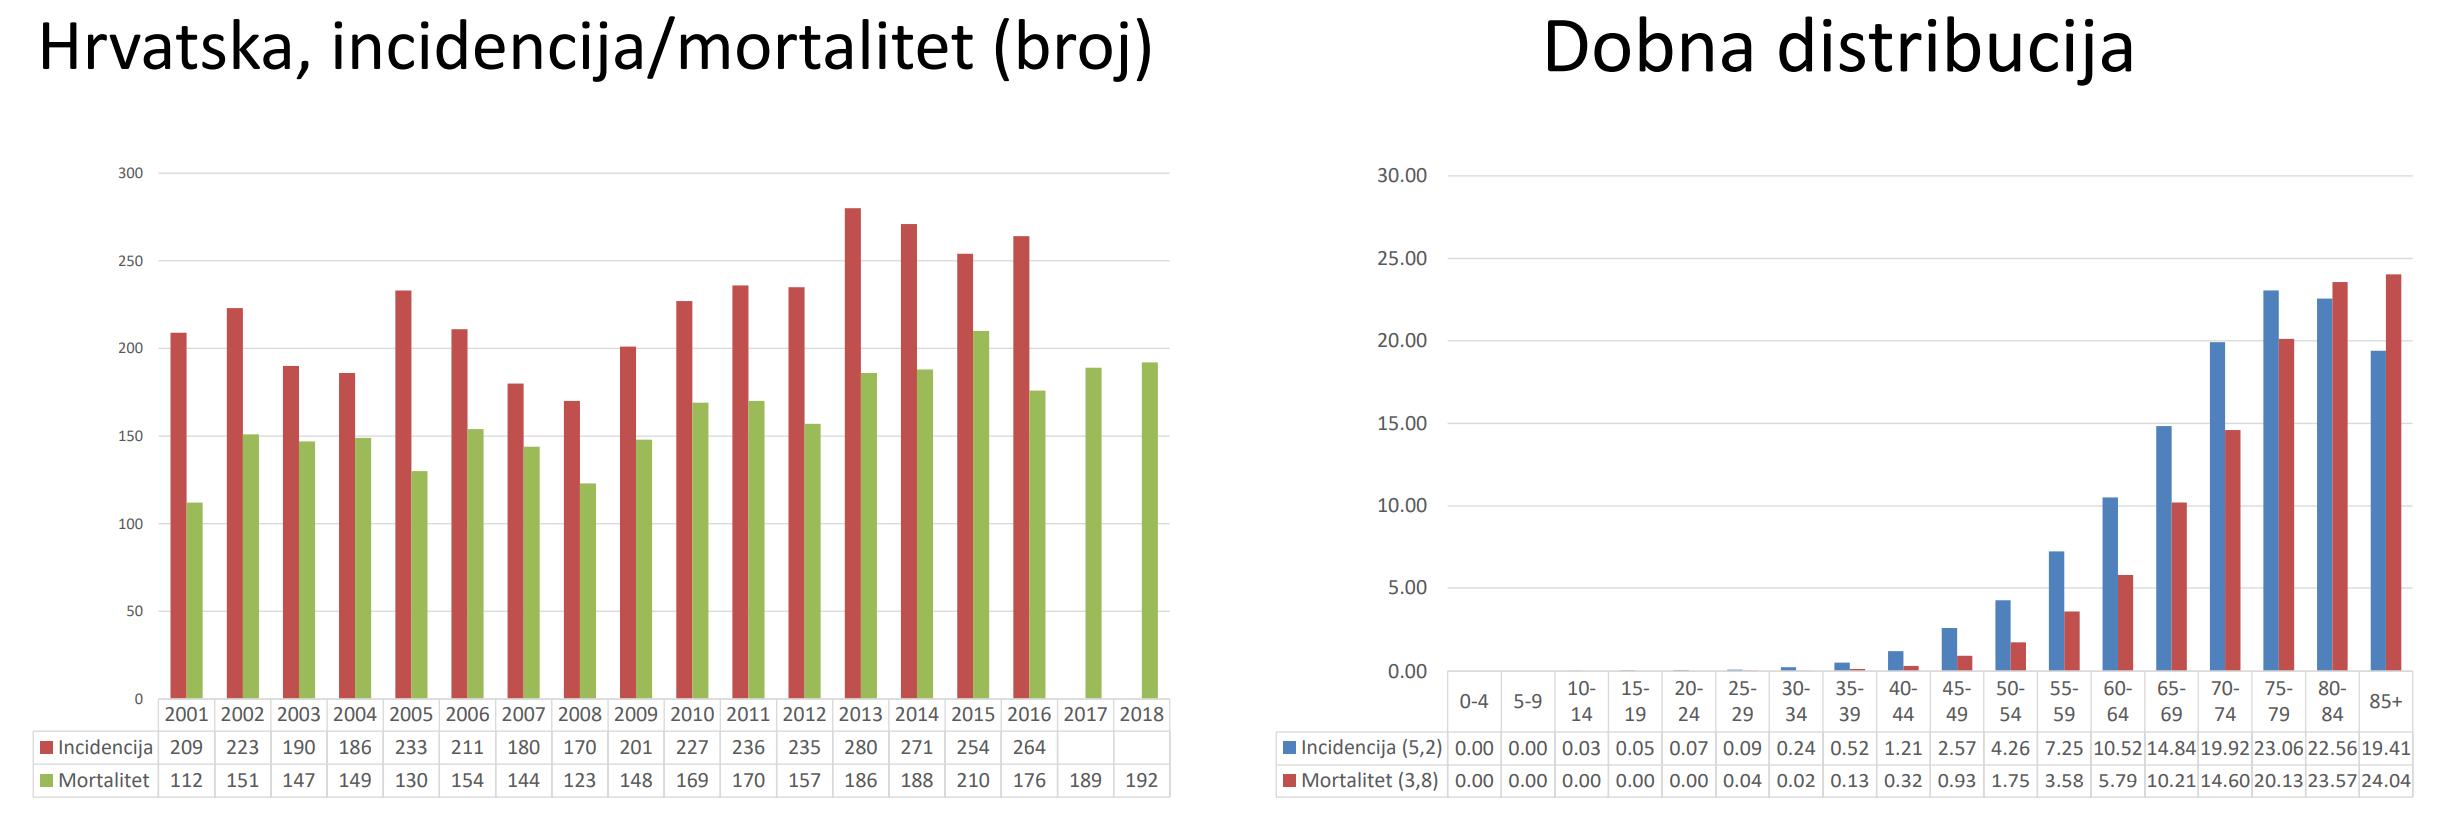 Hrvatska - incidencija, mortalitet i dobna distribucija